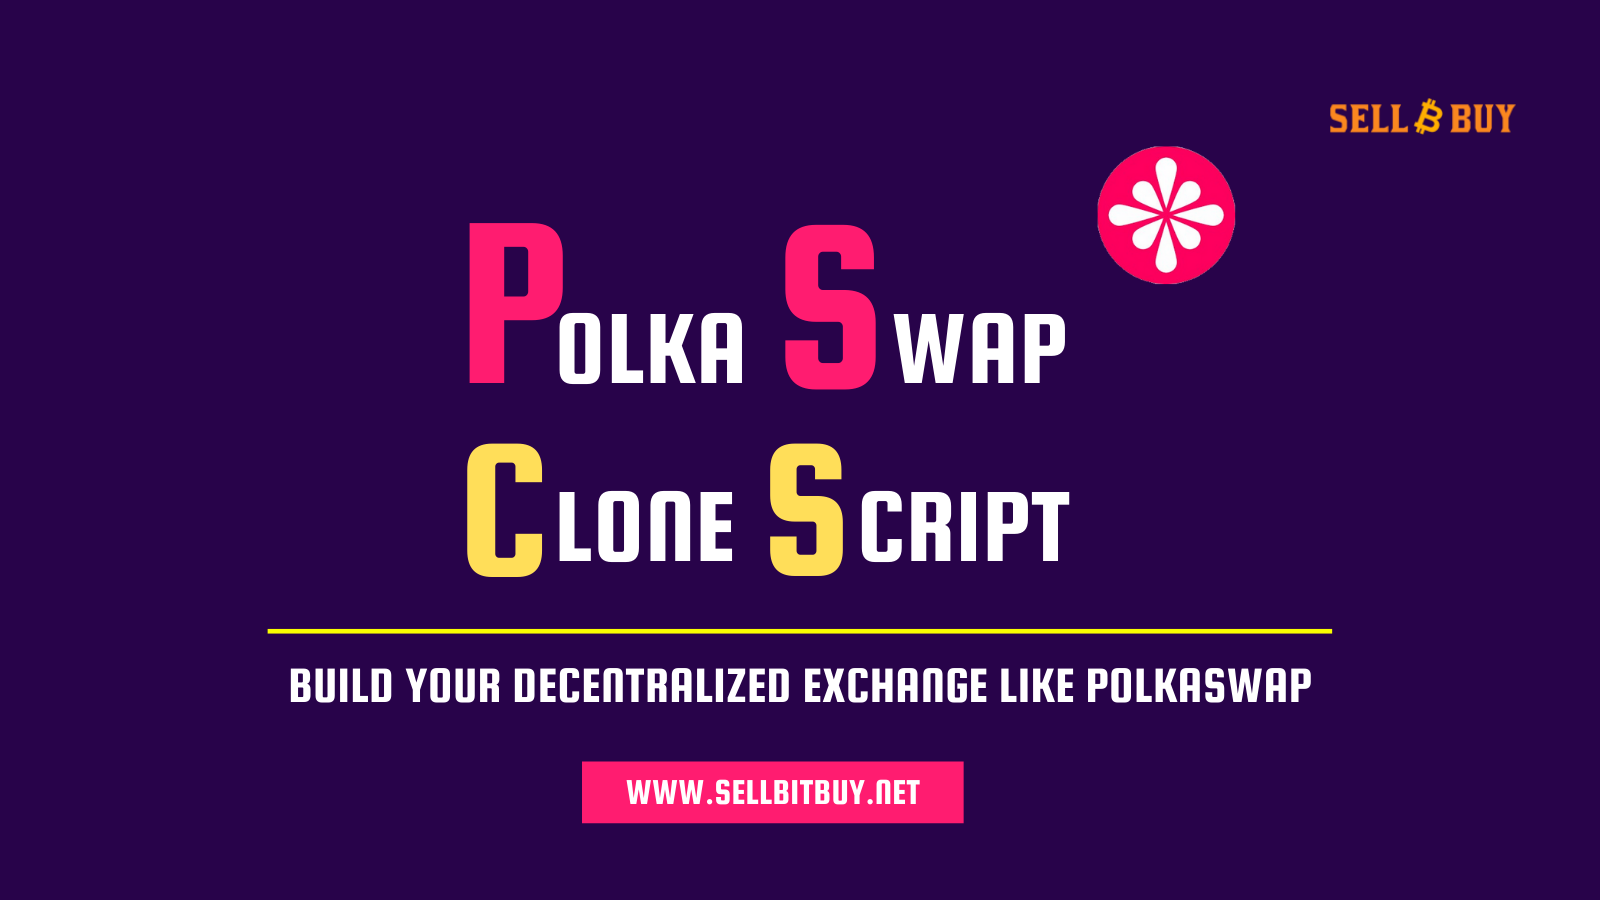 PolkaSwap Clone Script - Start DeFi-Based AMM DEX Platform Like PolkaSwap